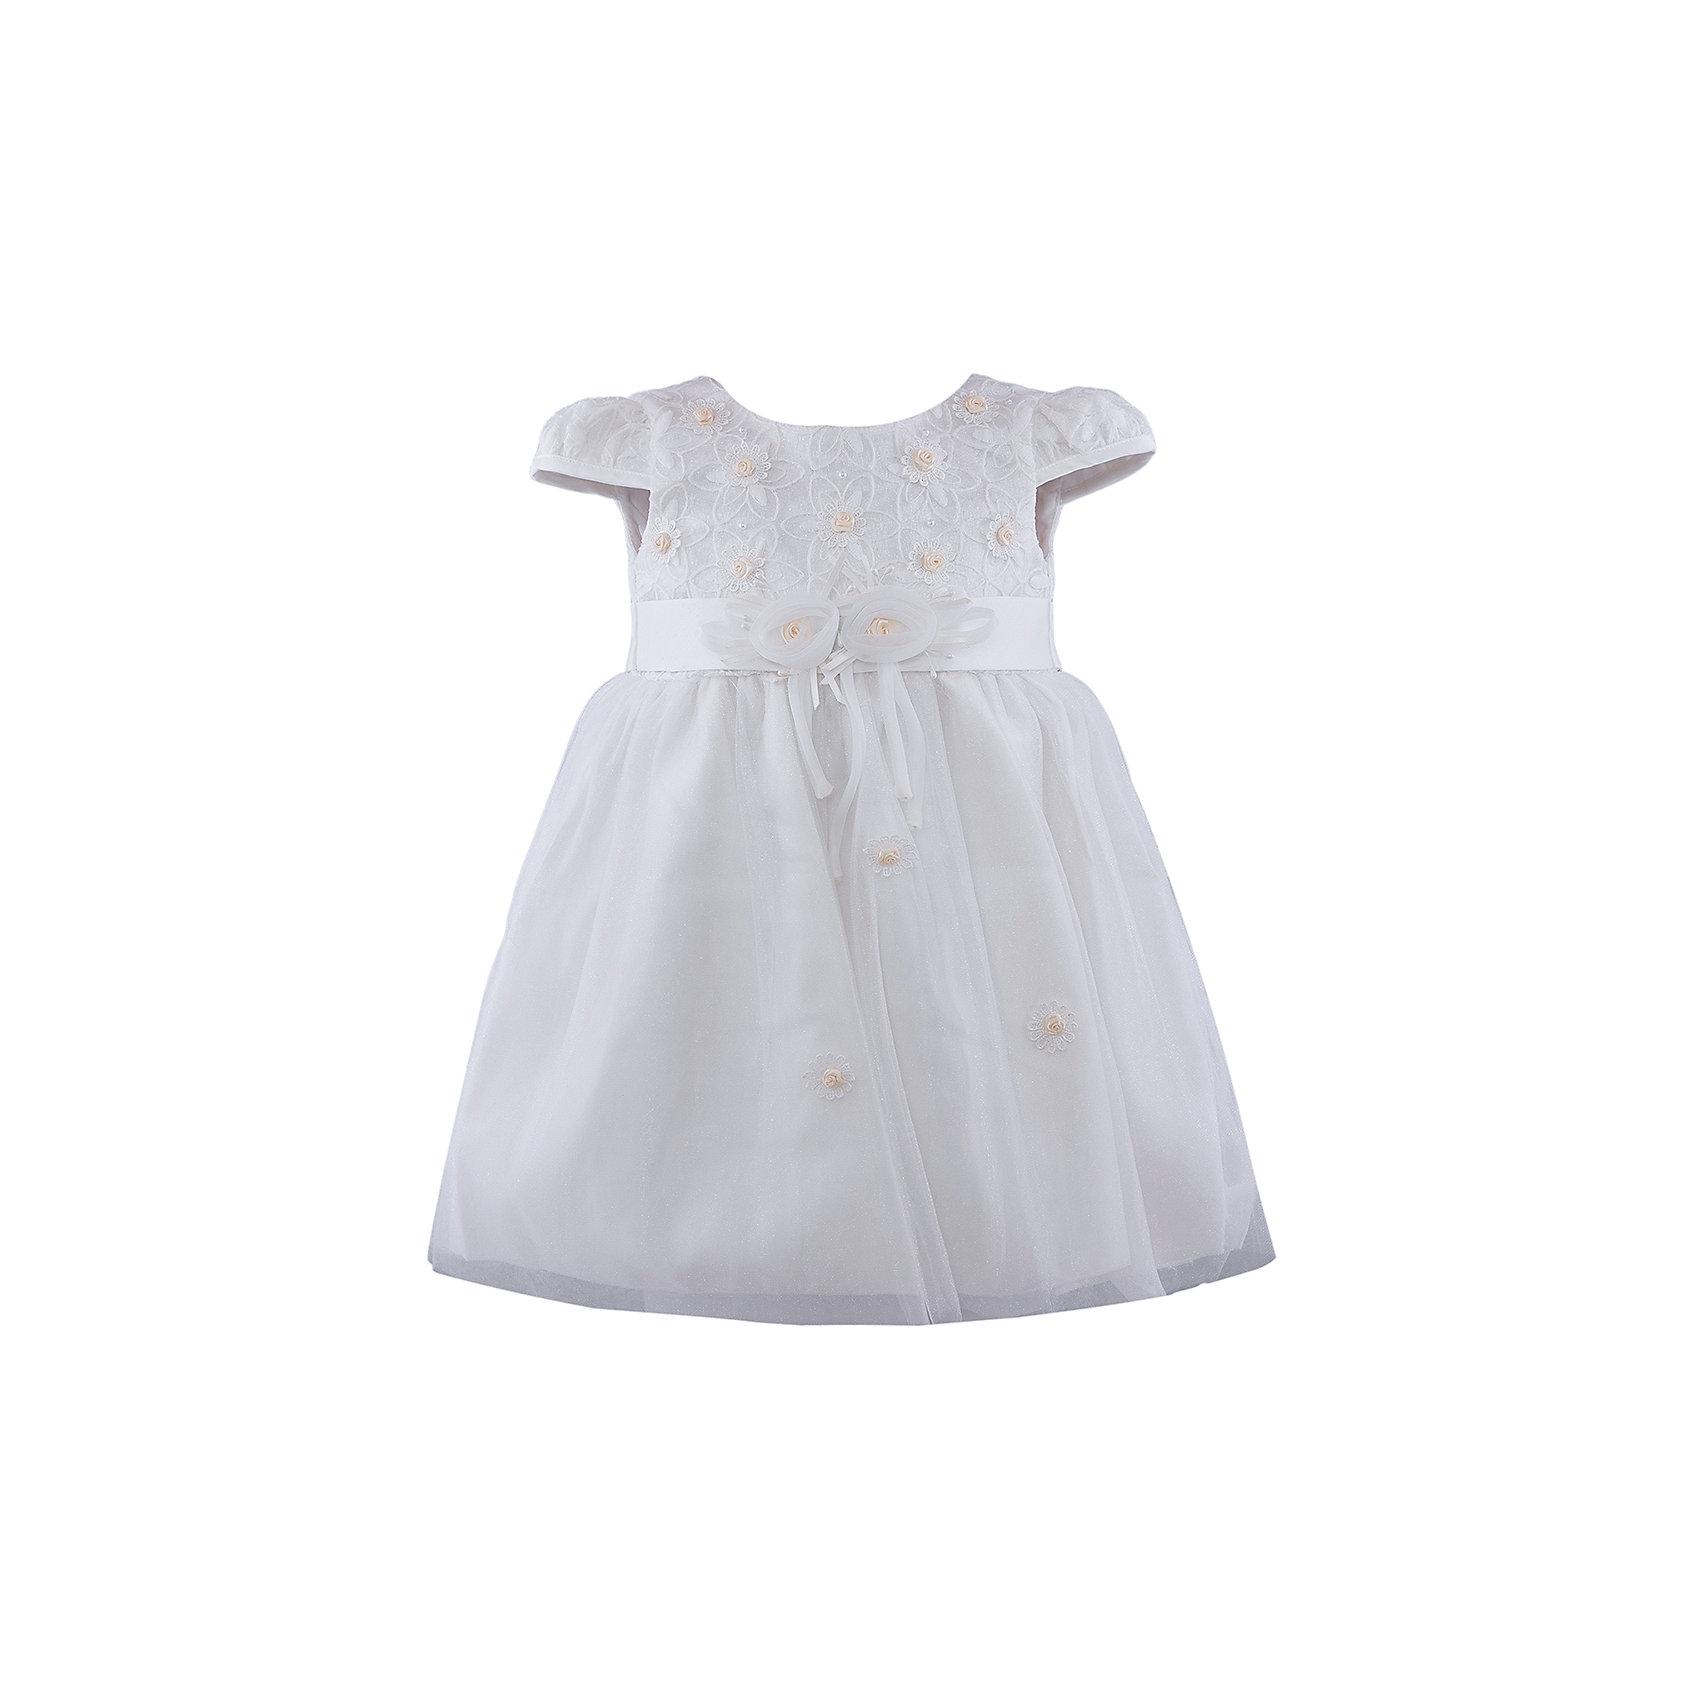 Vitacci Нарядное платье для девочки Vitacci